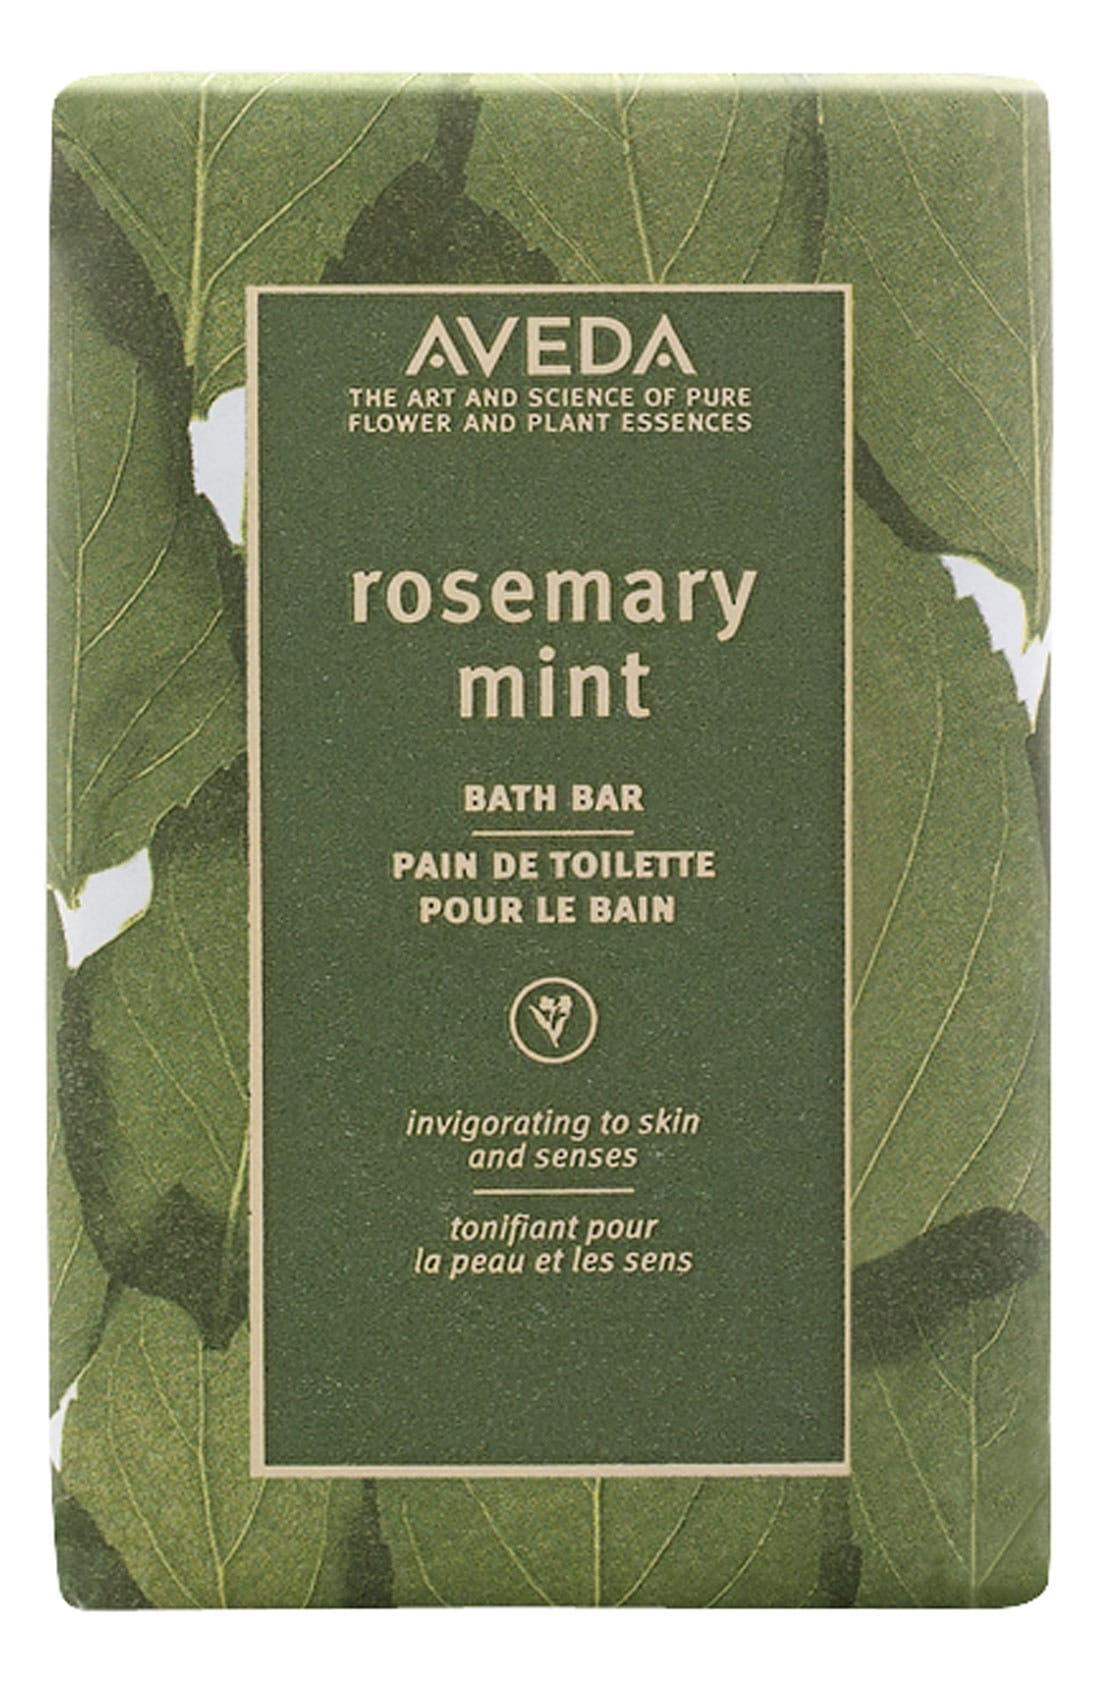 Aveda 'Rosemary Mint' Bath Bar